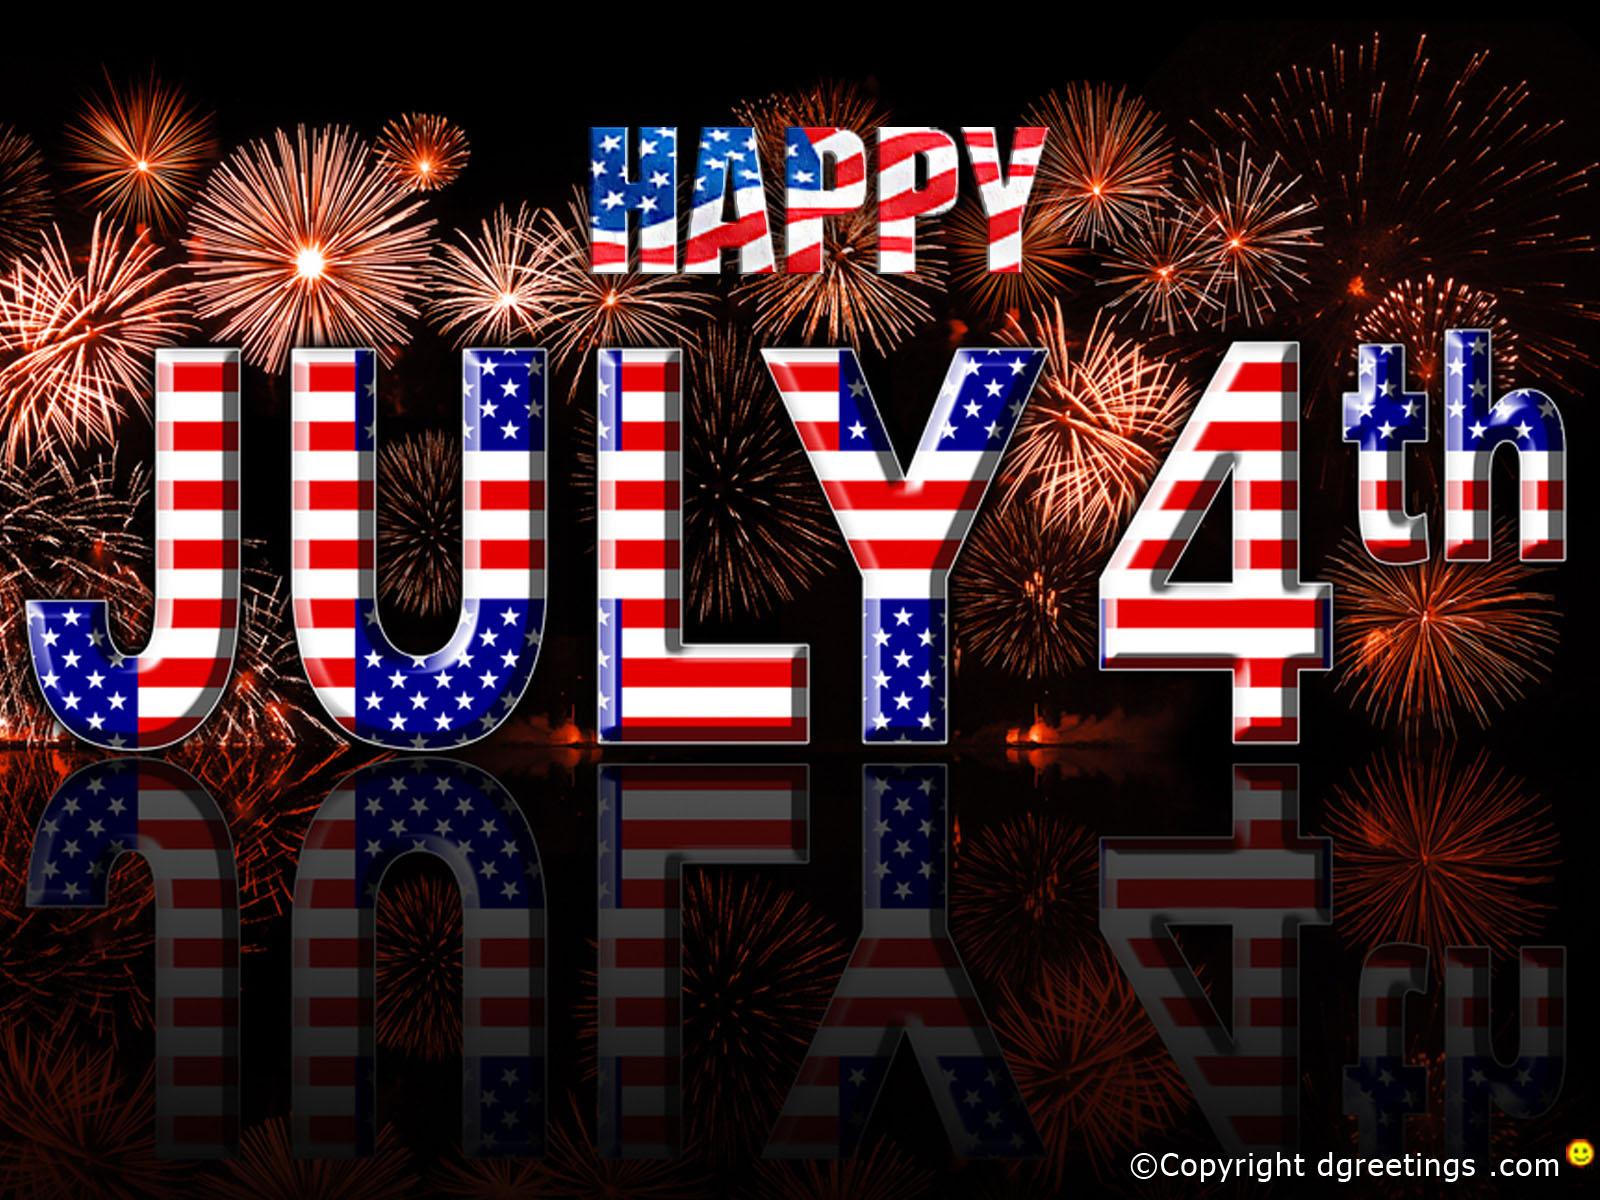 4th Of July Ipad Wallpaper Hd: Fourth Of July Free Wallpaper